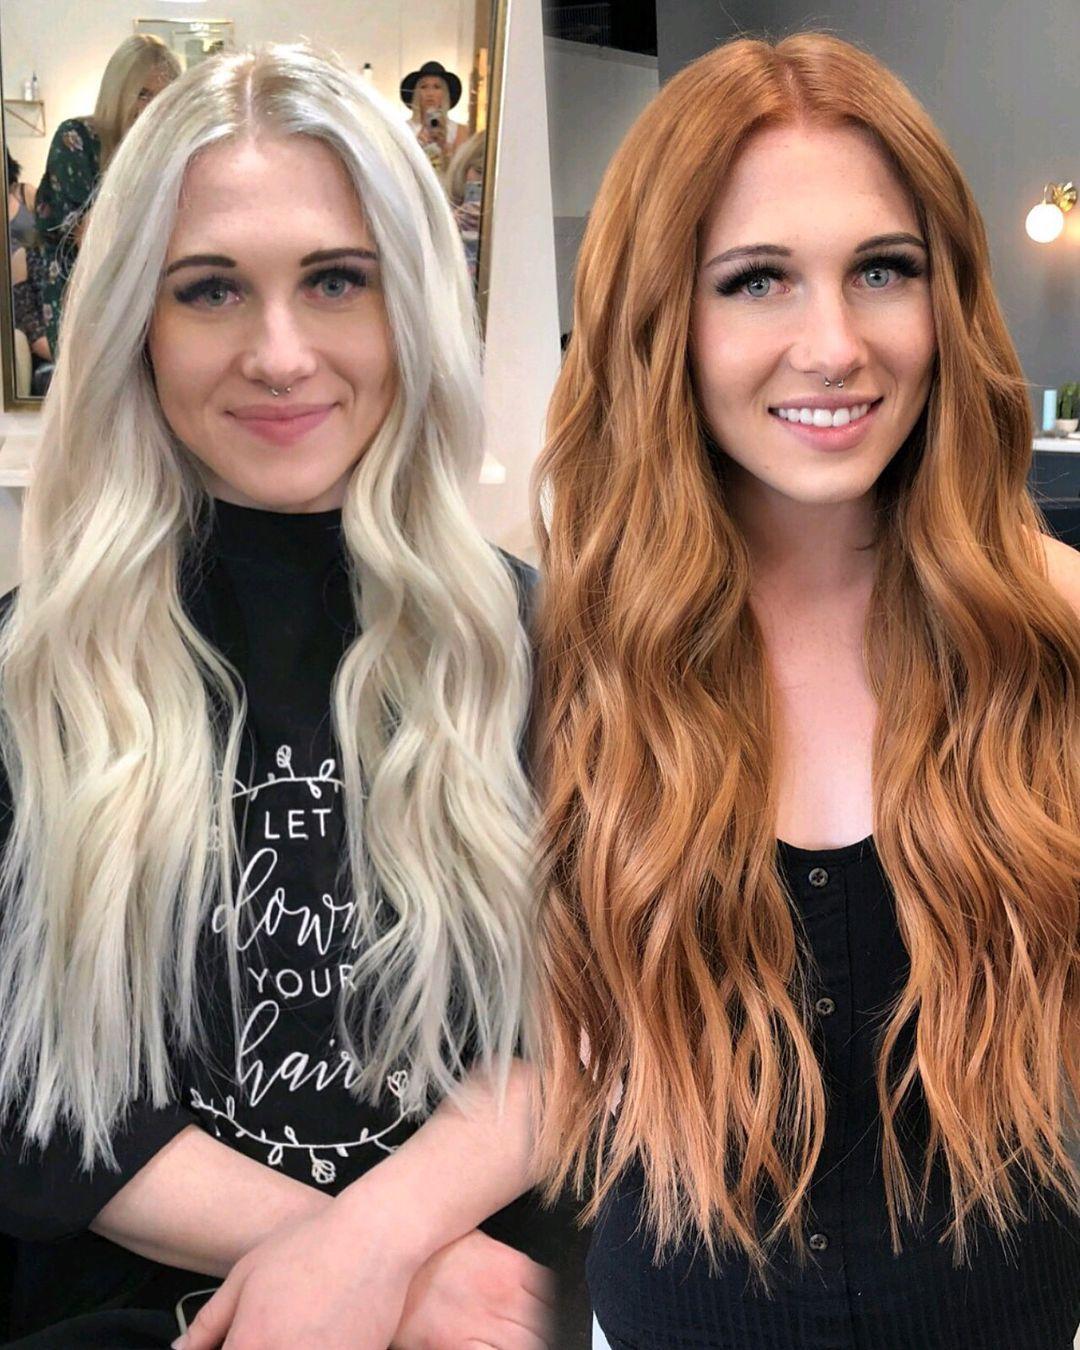 Jessi Gish On Instagram Julianne Hough Inspired Transformation